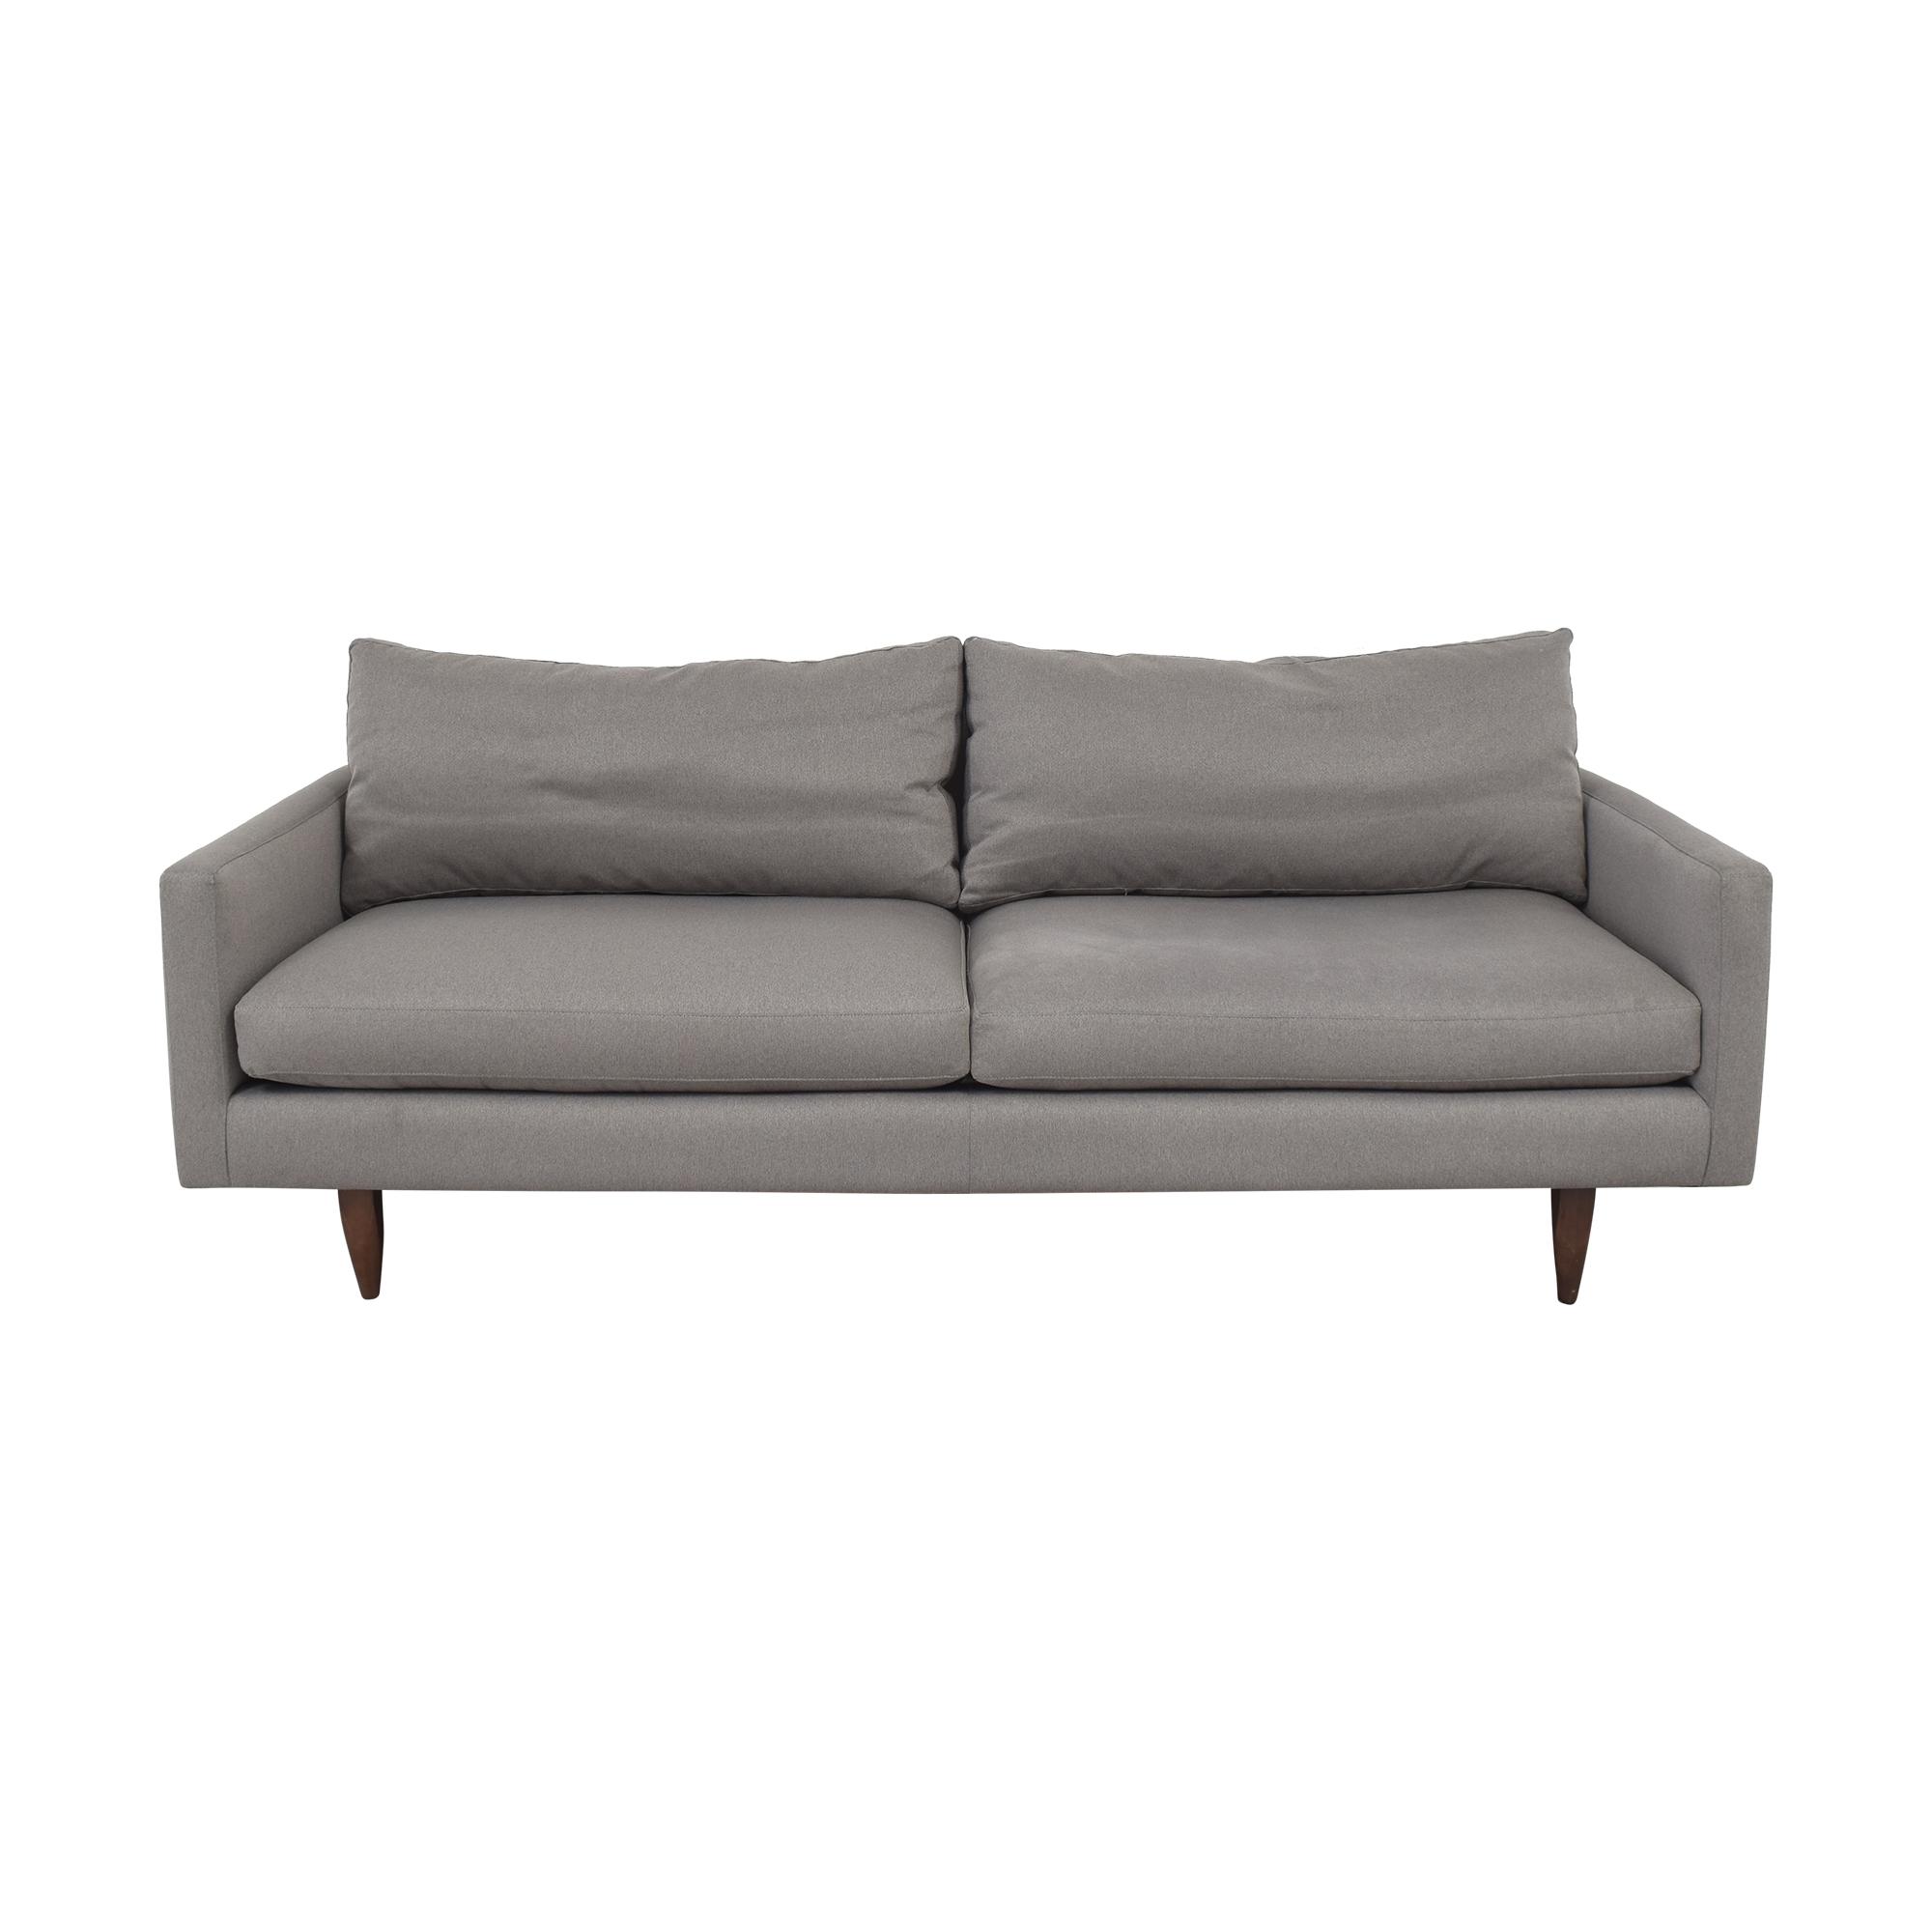 Room & Board Room & Board Jasper Two Cushion Sofa ct